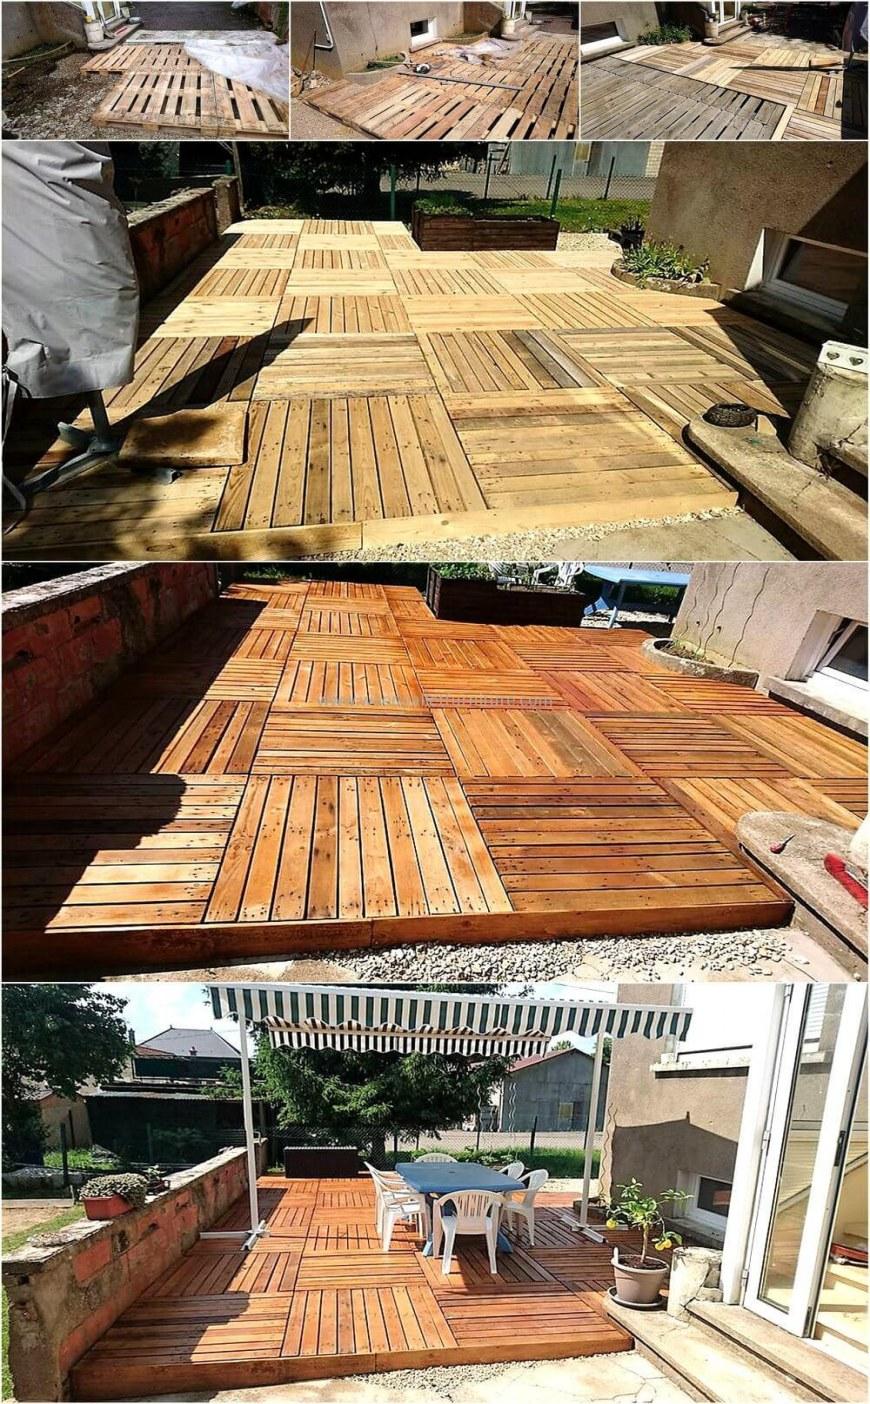 diy pallet ideas diy wooden pallets garden terrace of diy pallet ideas